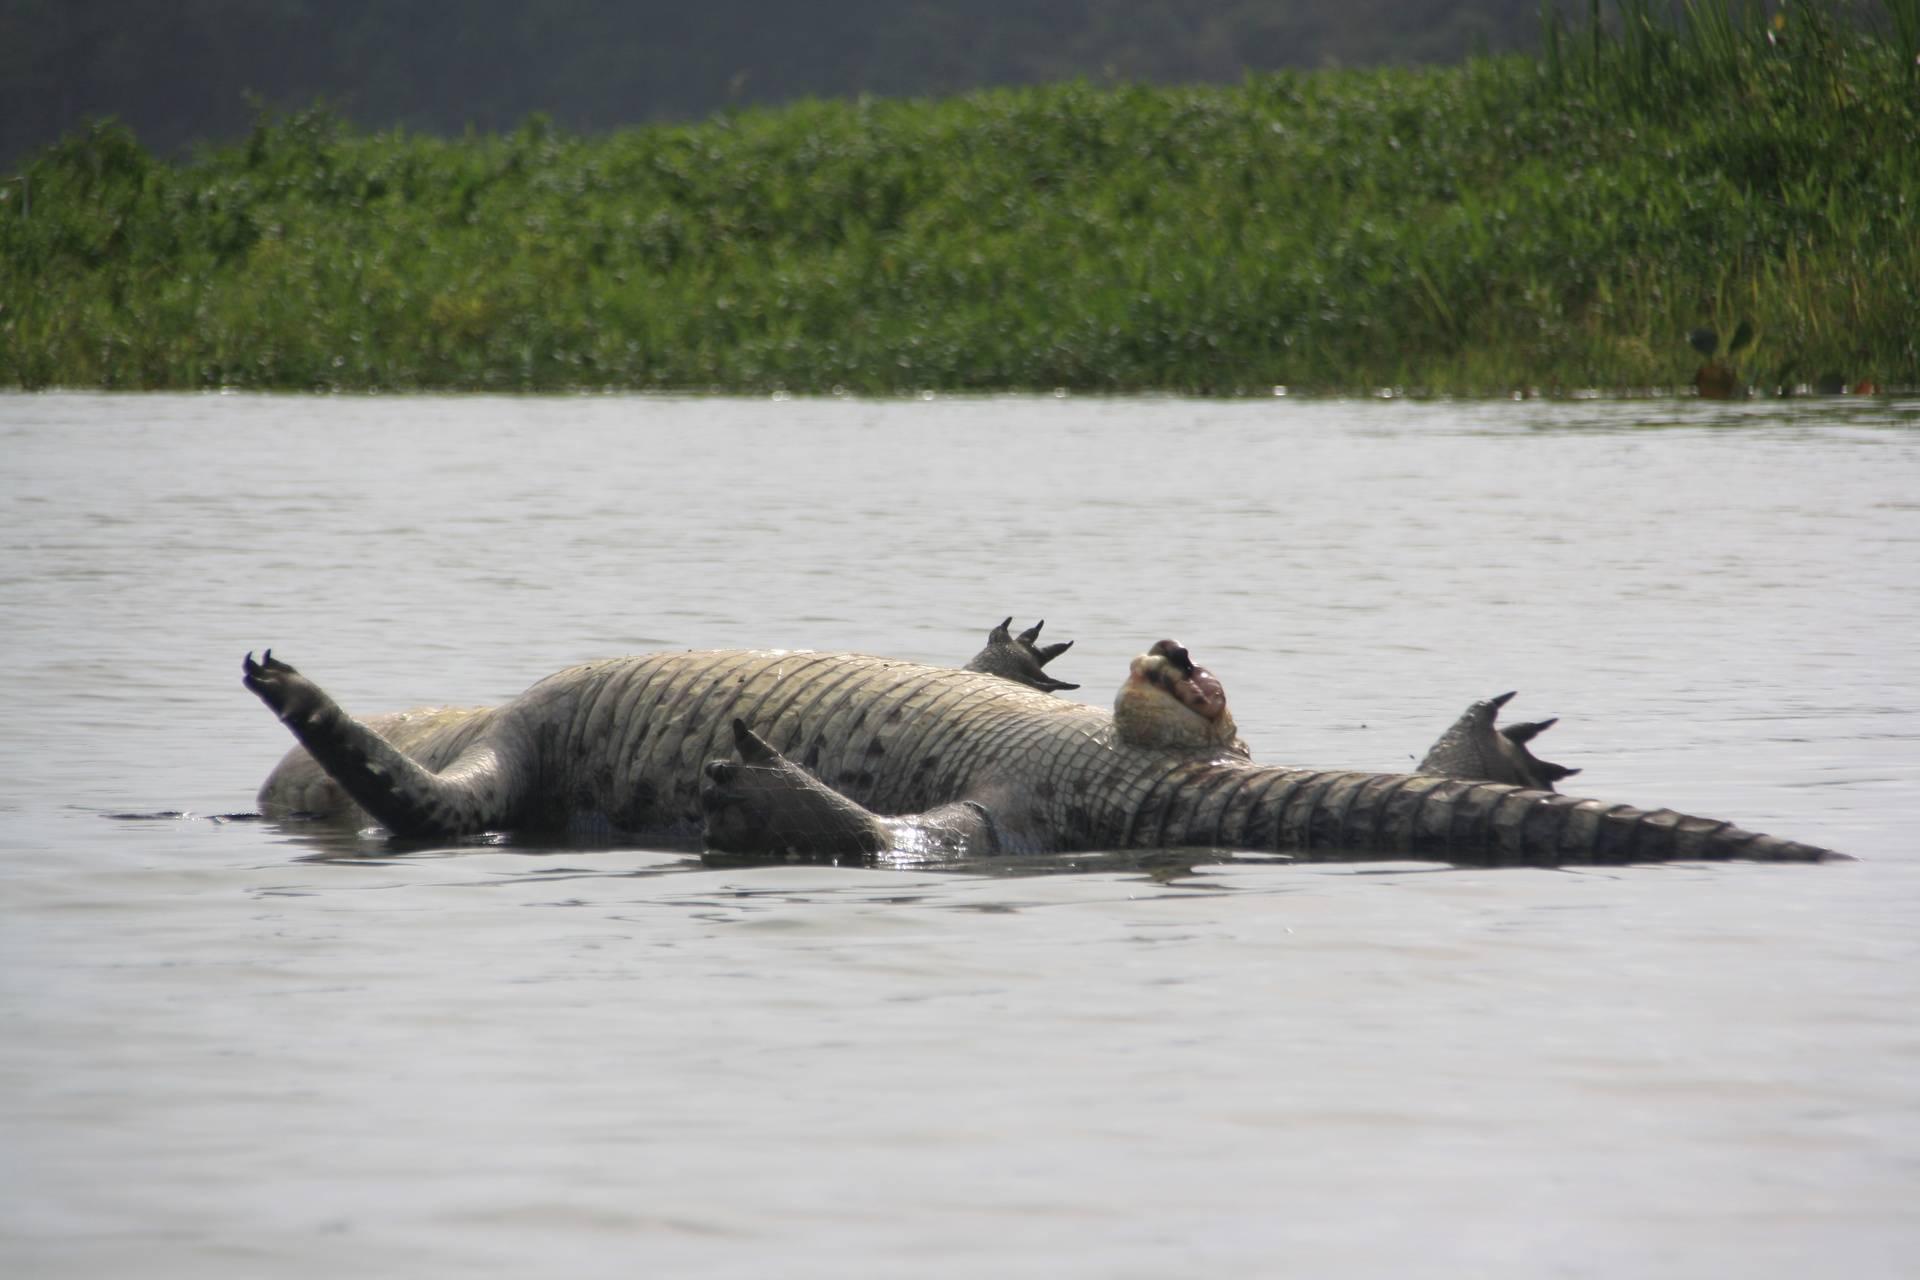 Dead Crocodile near Monkey Island